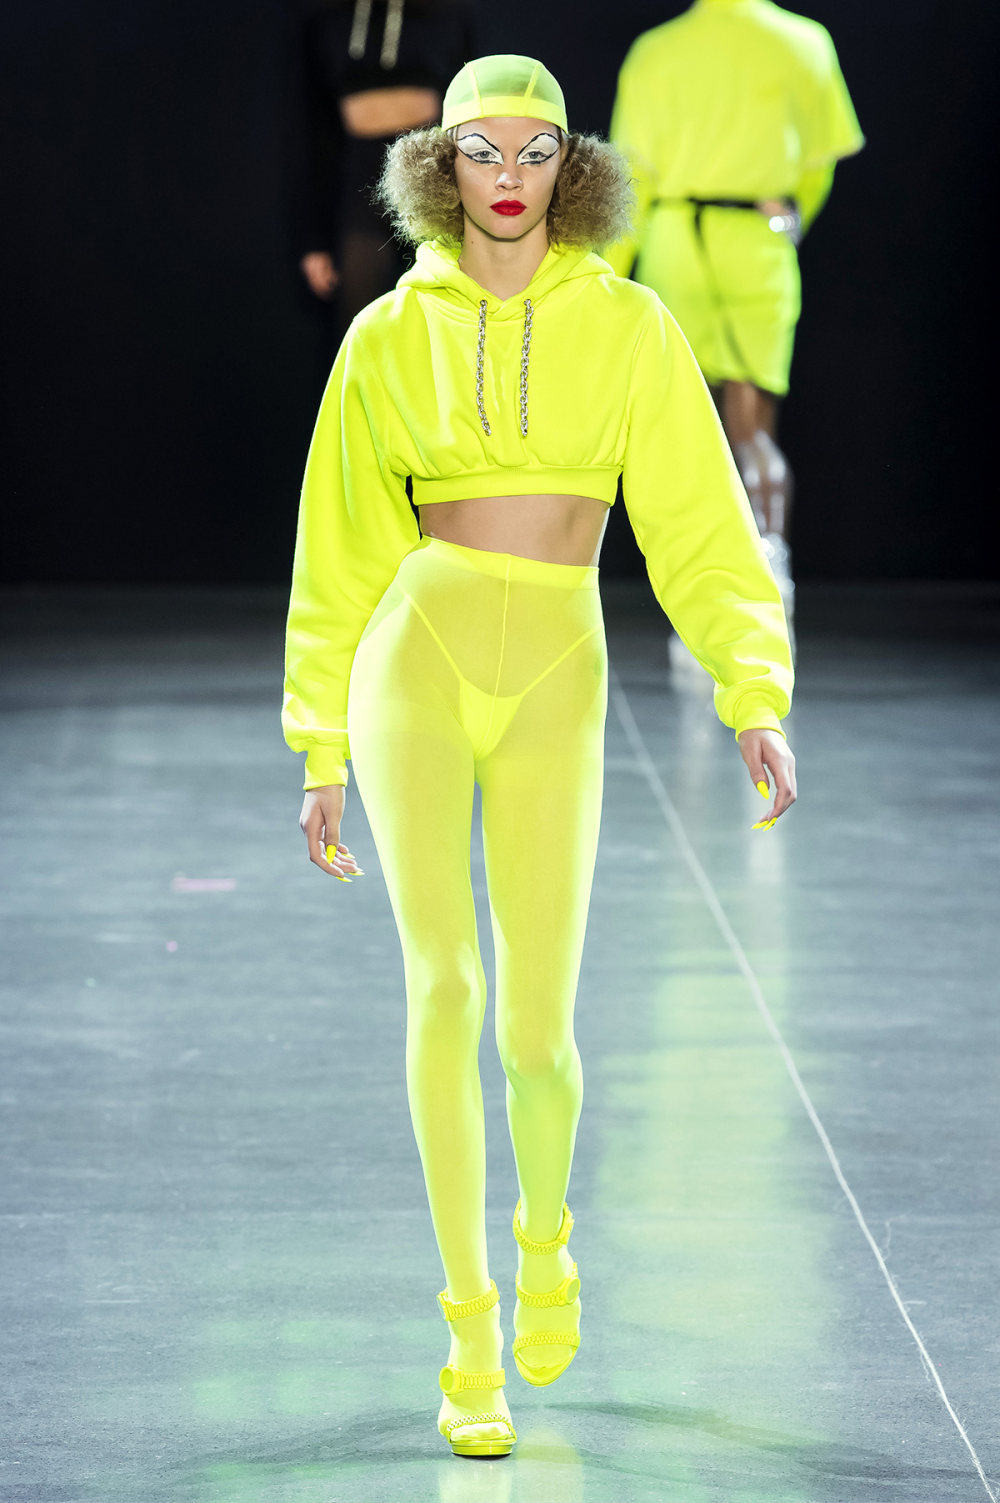 Christian Cowan时装系列虽然巨大的薄纱层状服装并没有那么特别-20.jpg